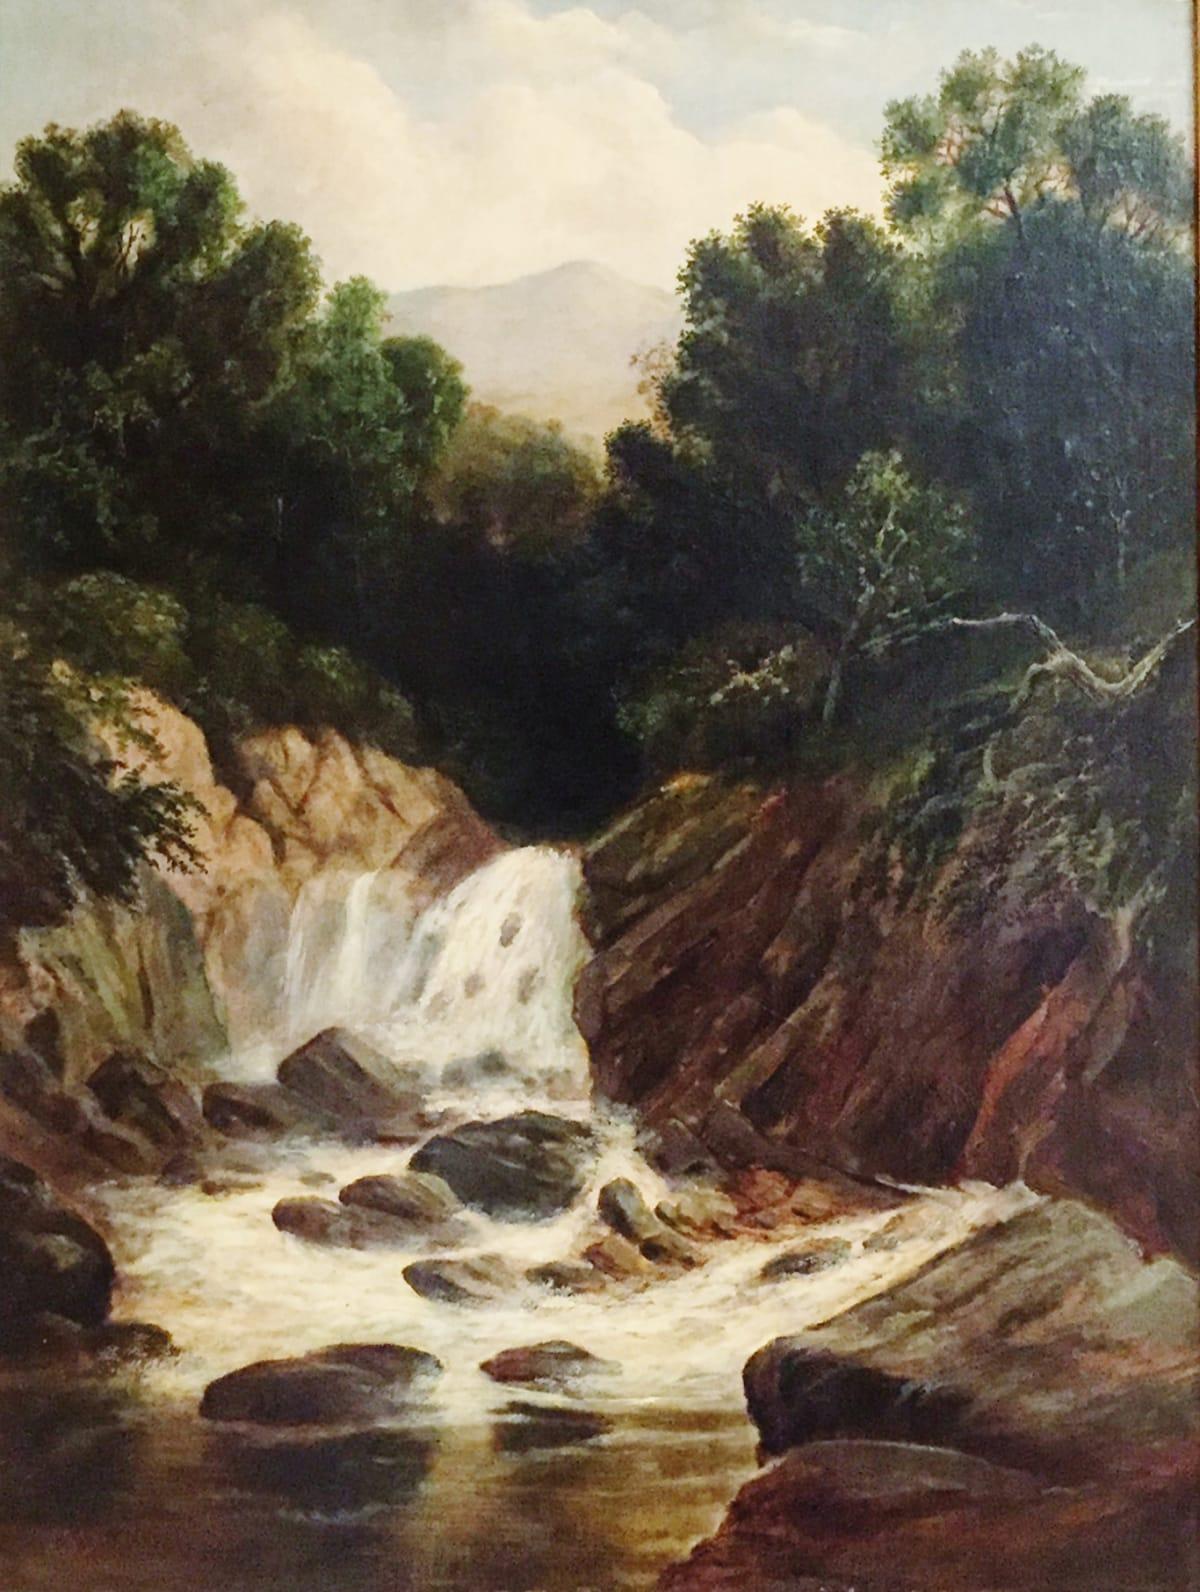 Robert Scott Duncanson Landscape (Waterfall with Rock Lion Formation), c. 1865 Framed: 31 3/4 x 25 3/4 x 2 1/4 Unframed: 24 x 18